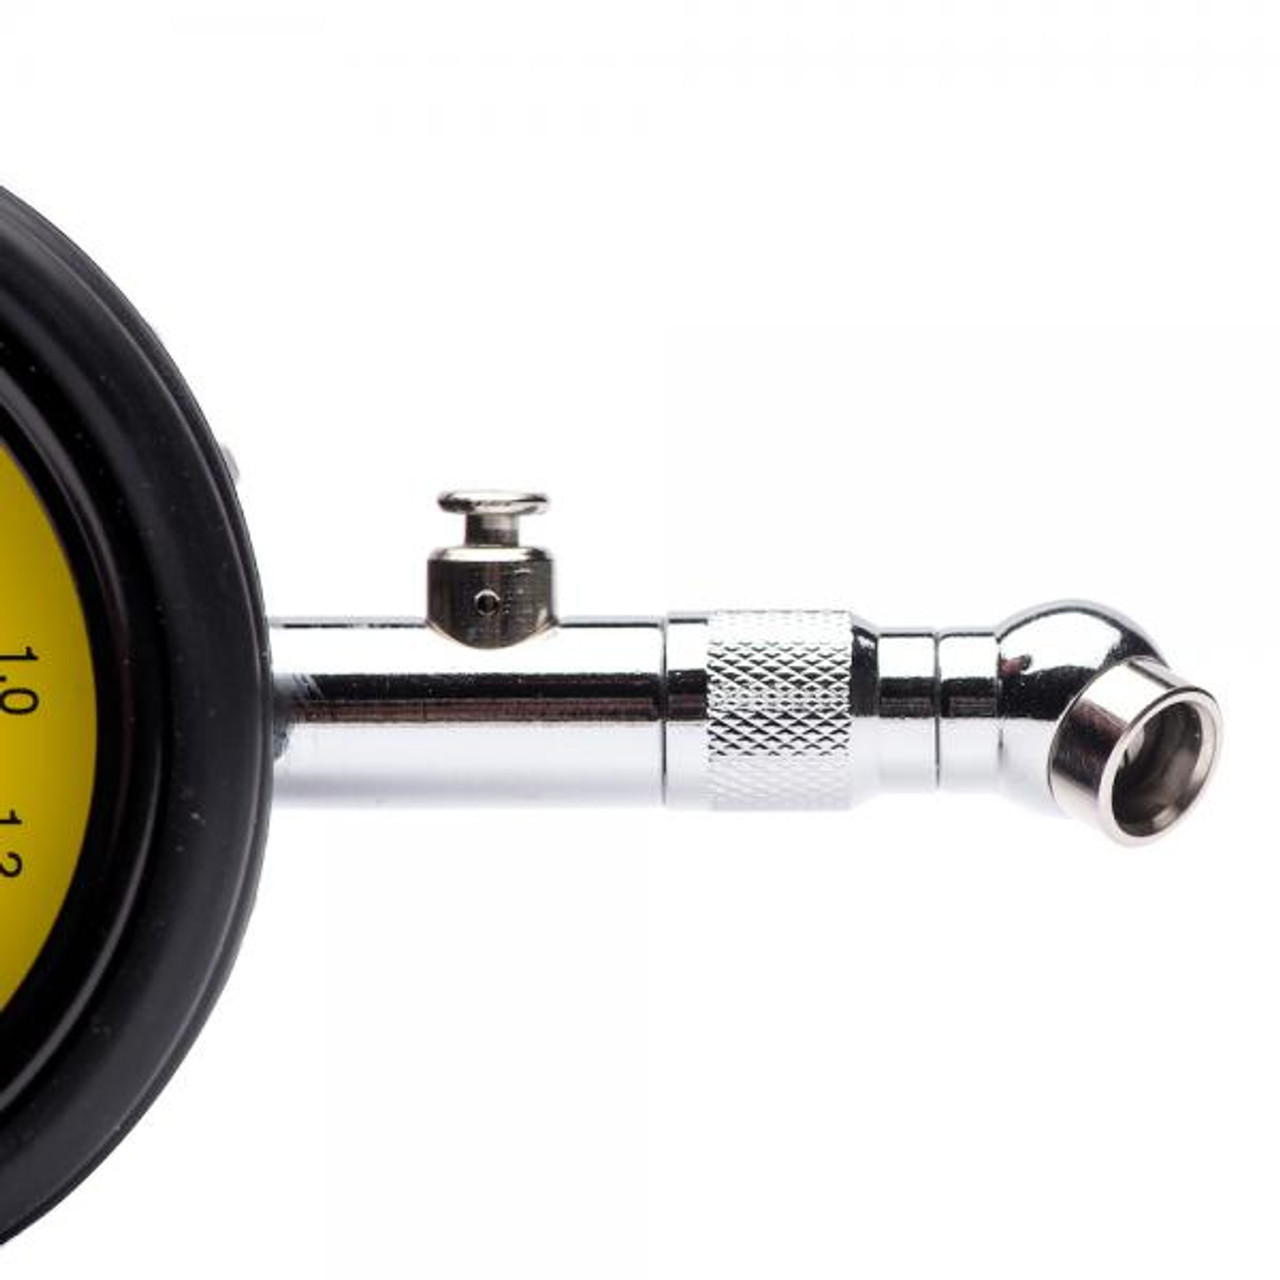 Analog tire pressure meter with valve 0- 15PSI